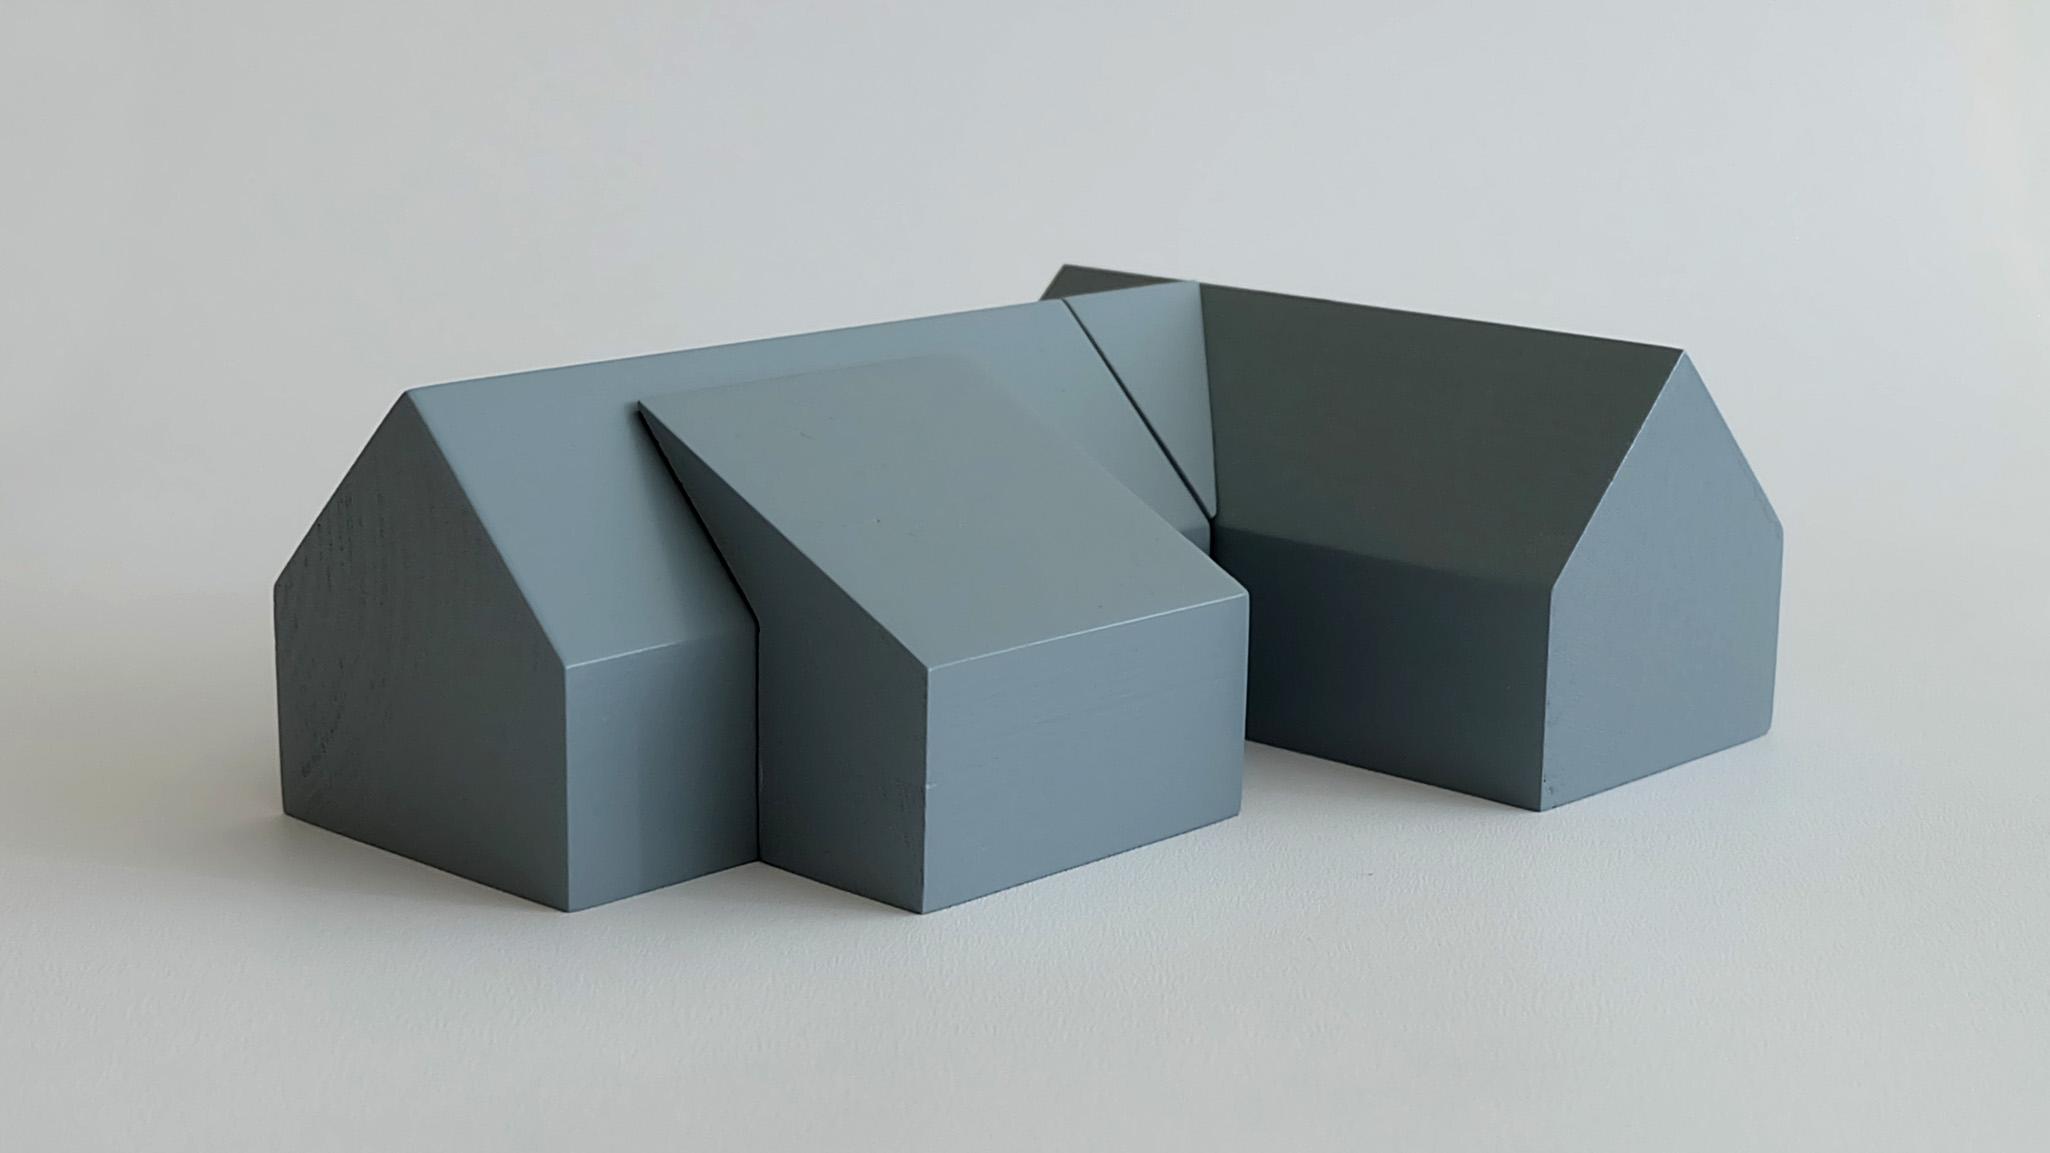 L34:  L32 + mono-pitch roof porch